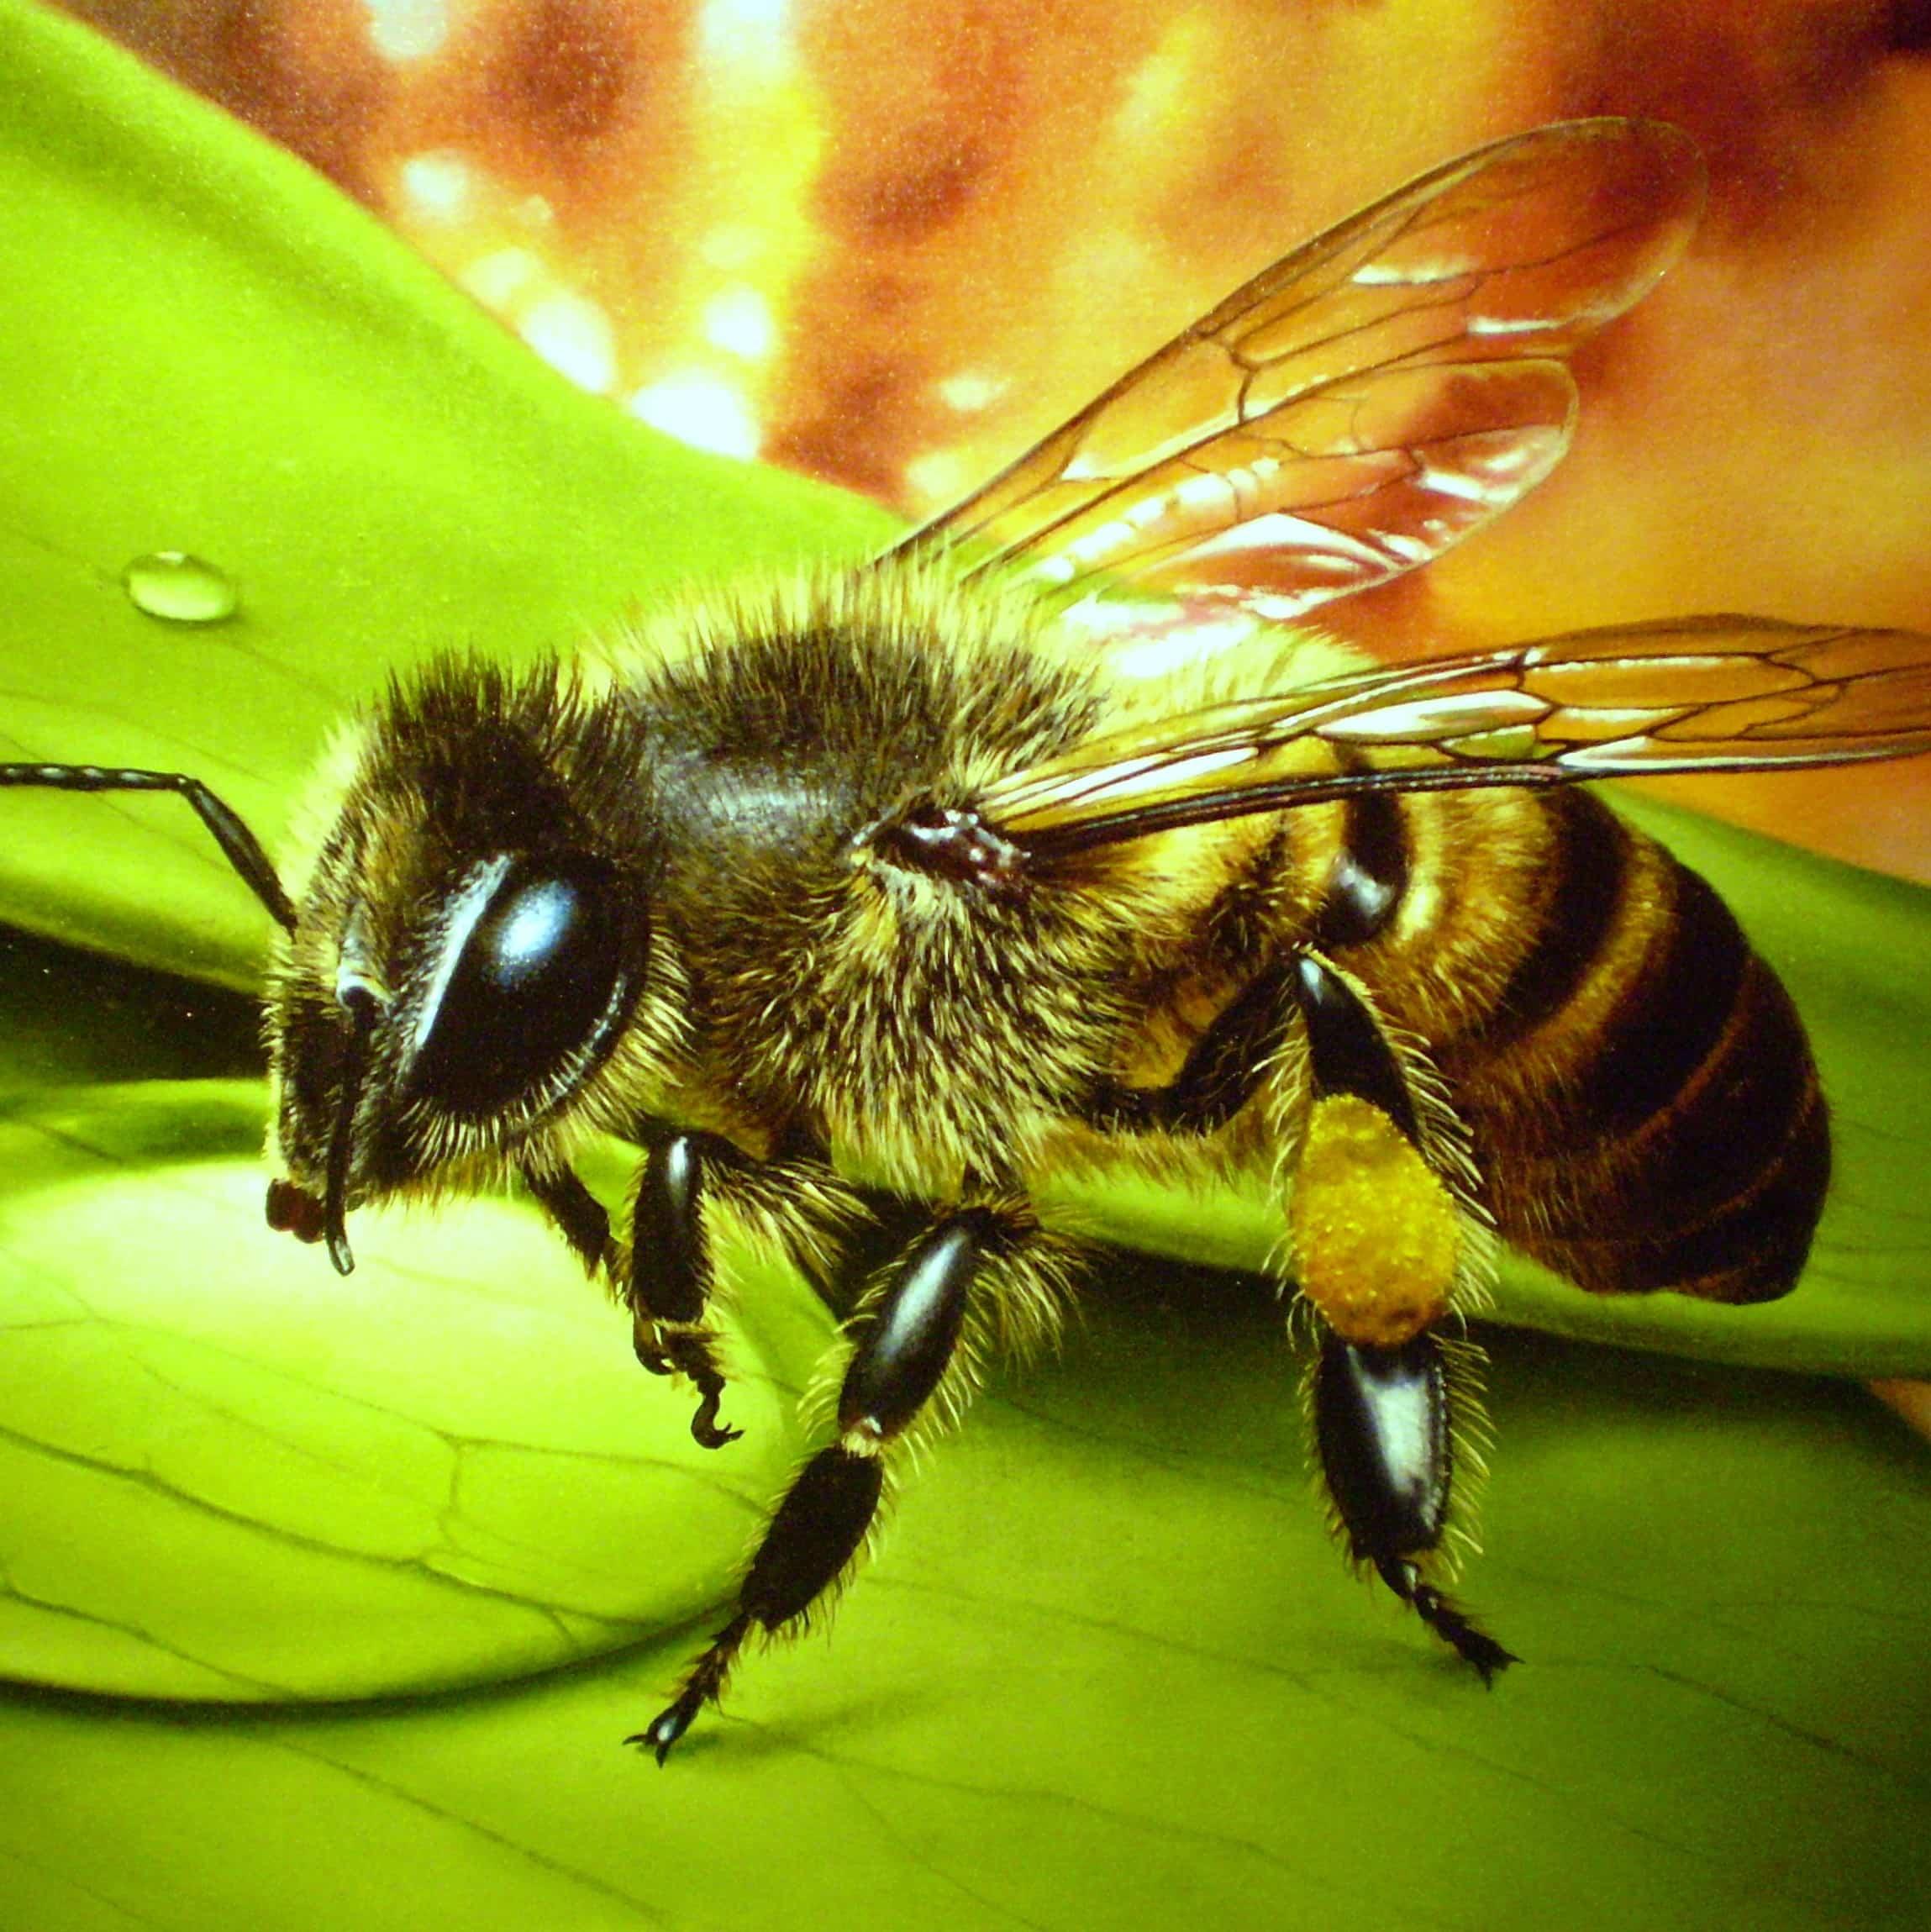 Природное лечение артрита и ревматизма пчелами